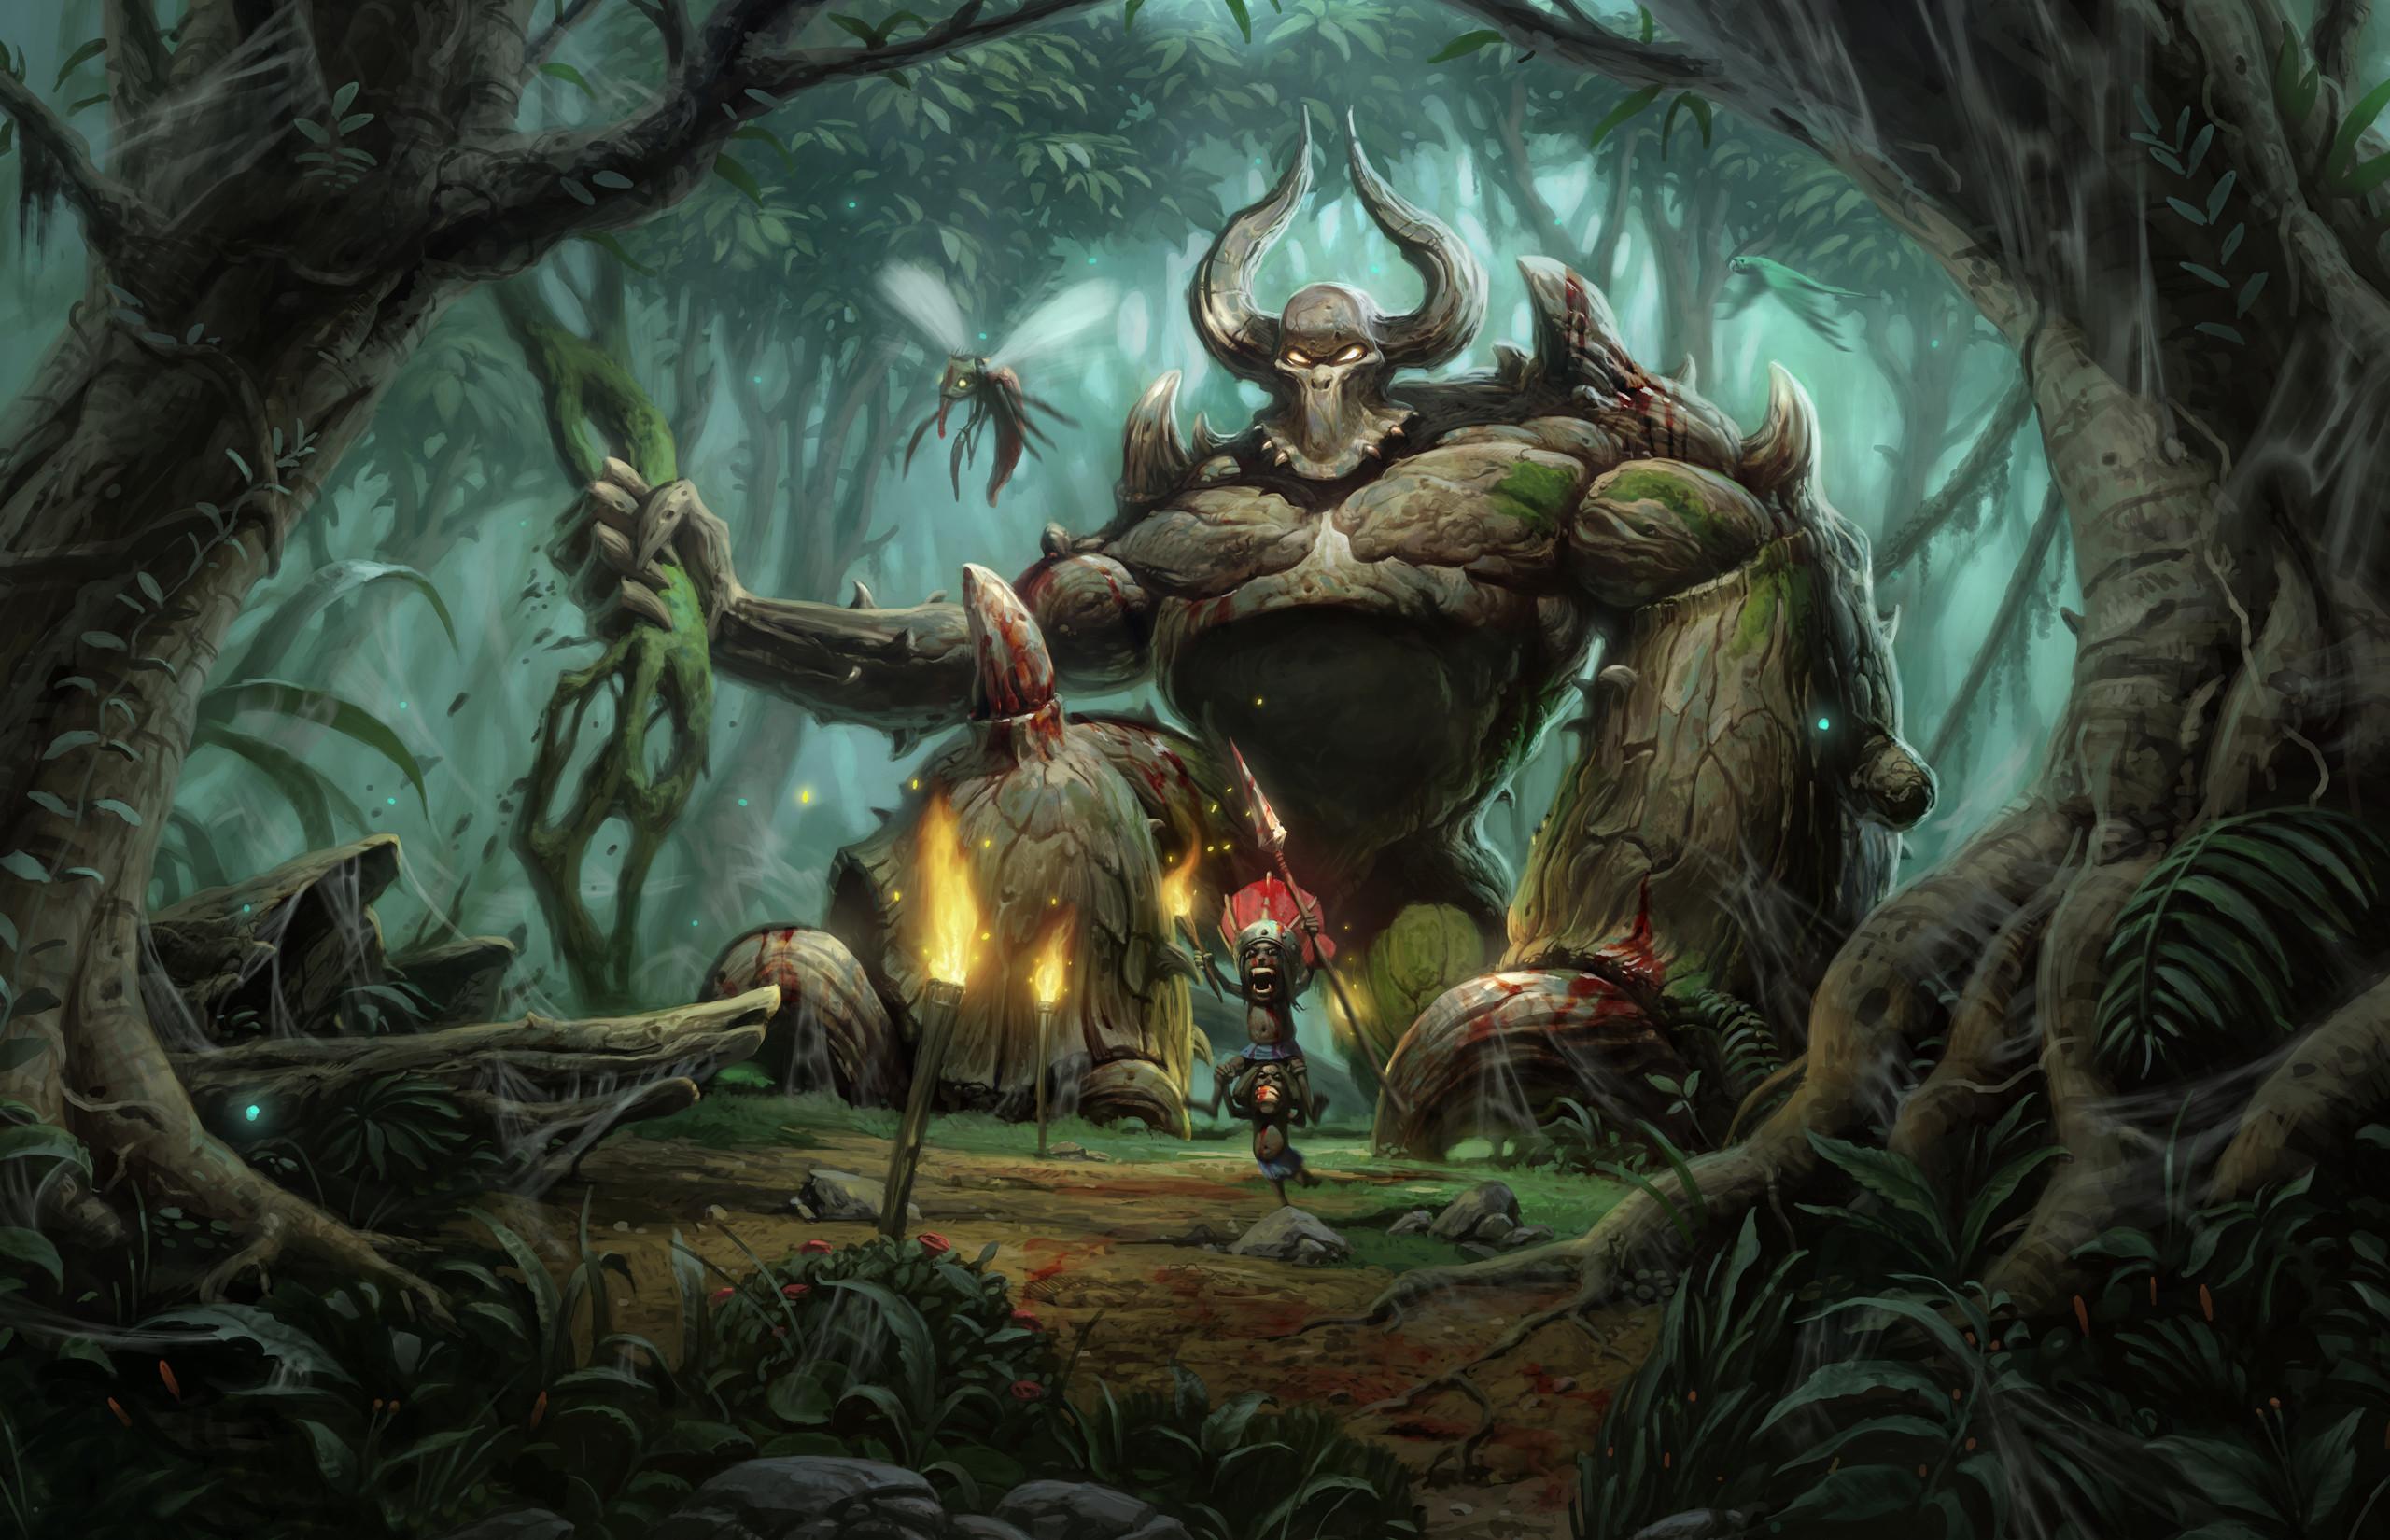 Wallpaper Diablo Diablo II Games Diablo 2